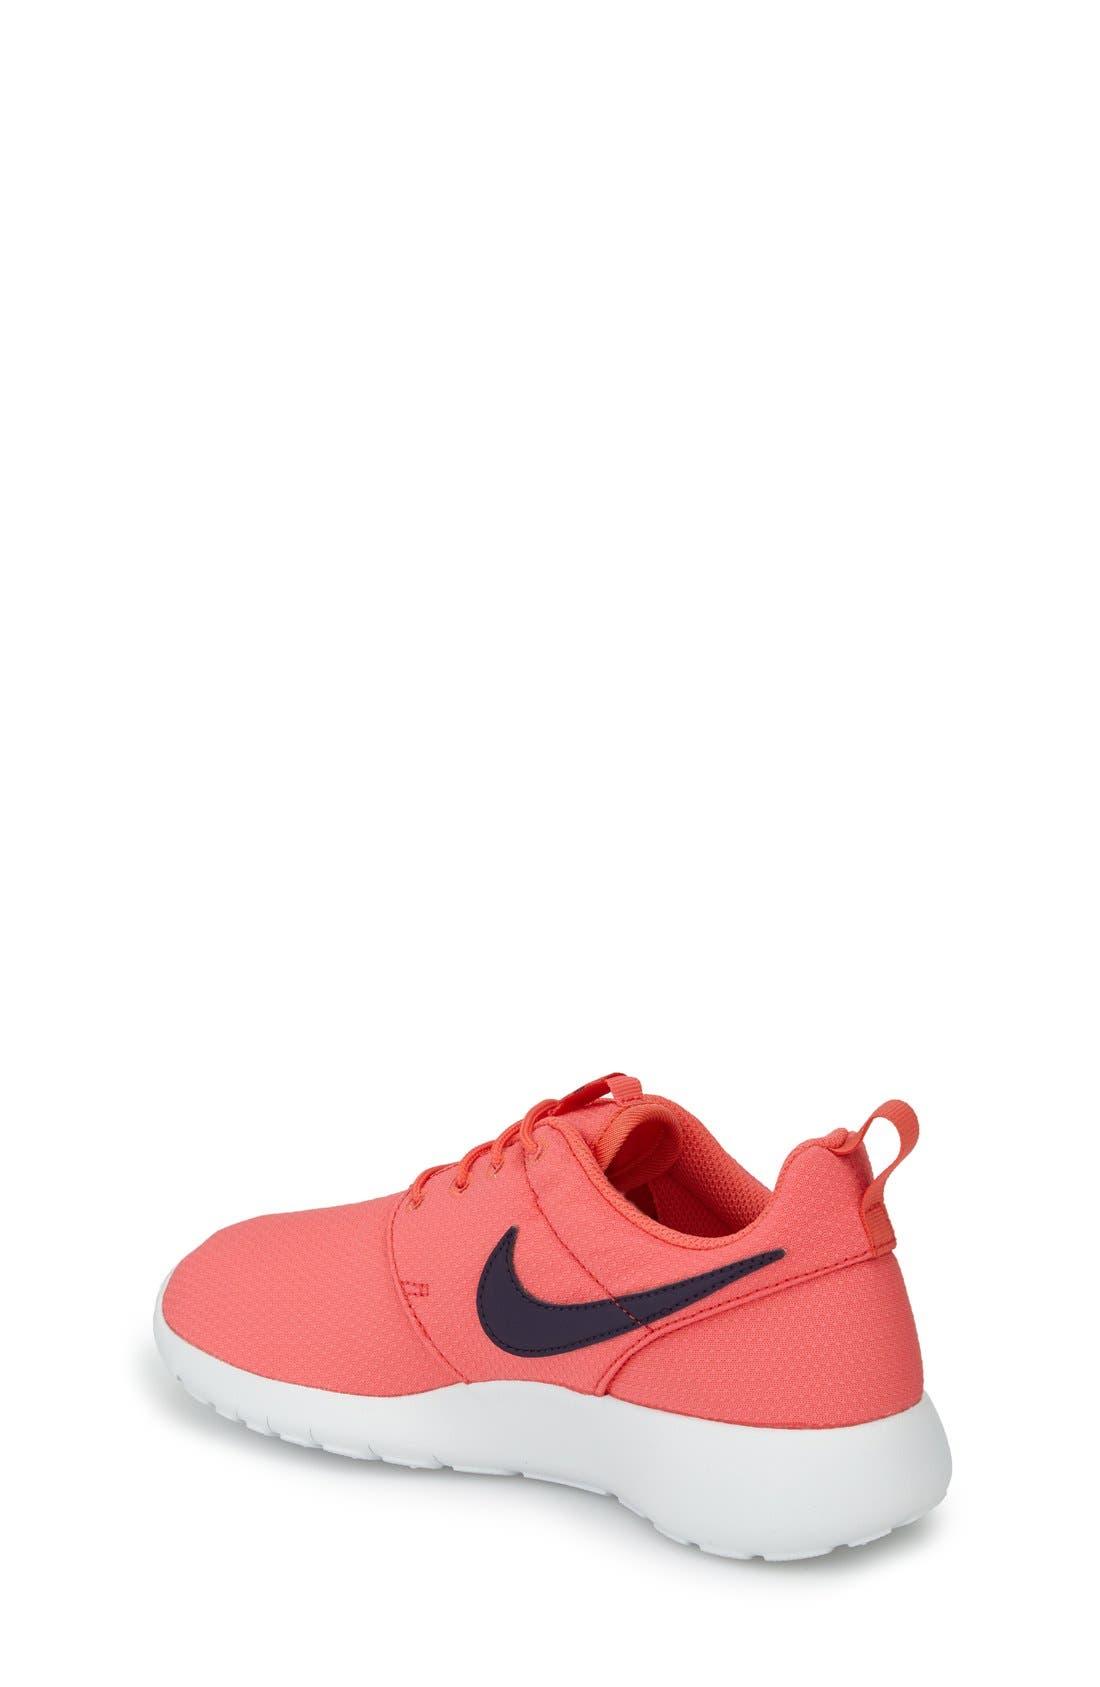 'Roshe Run' Athletic Shoe,                             Alternate thumbnail 185, color,